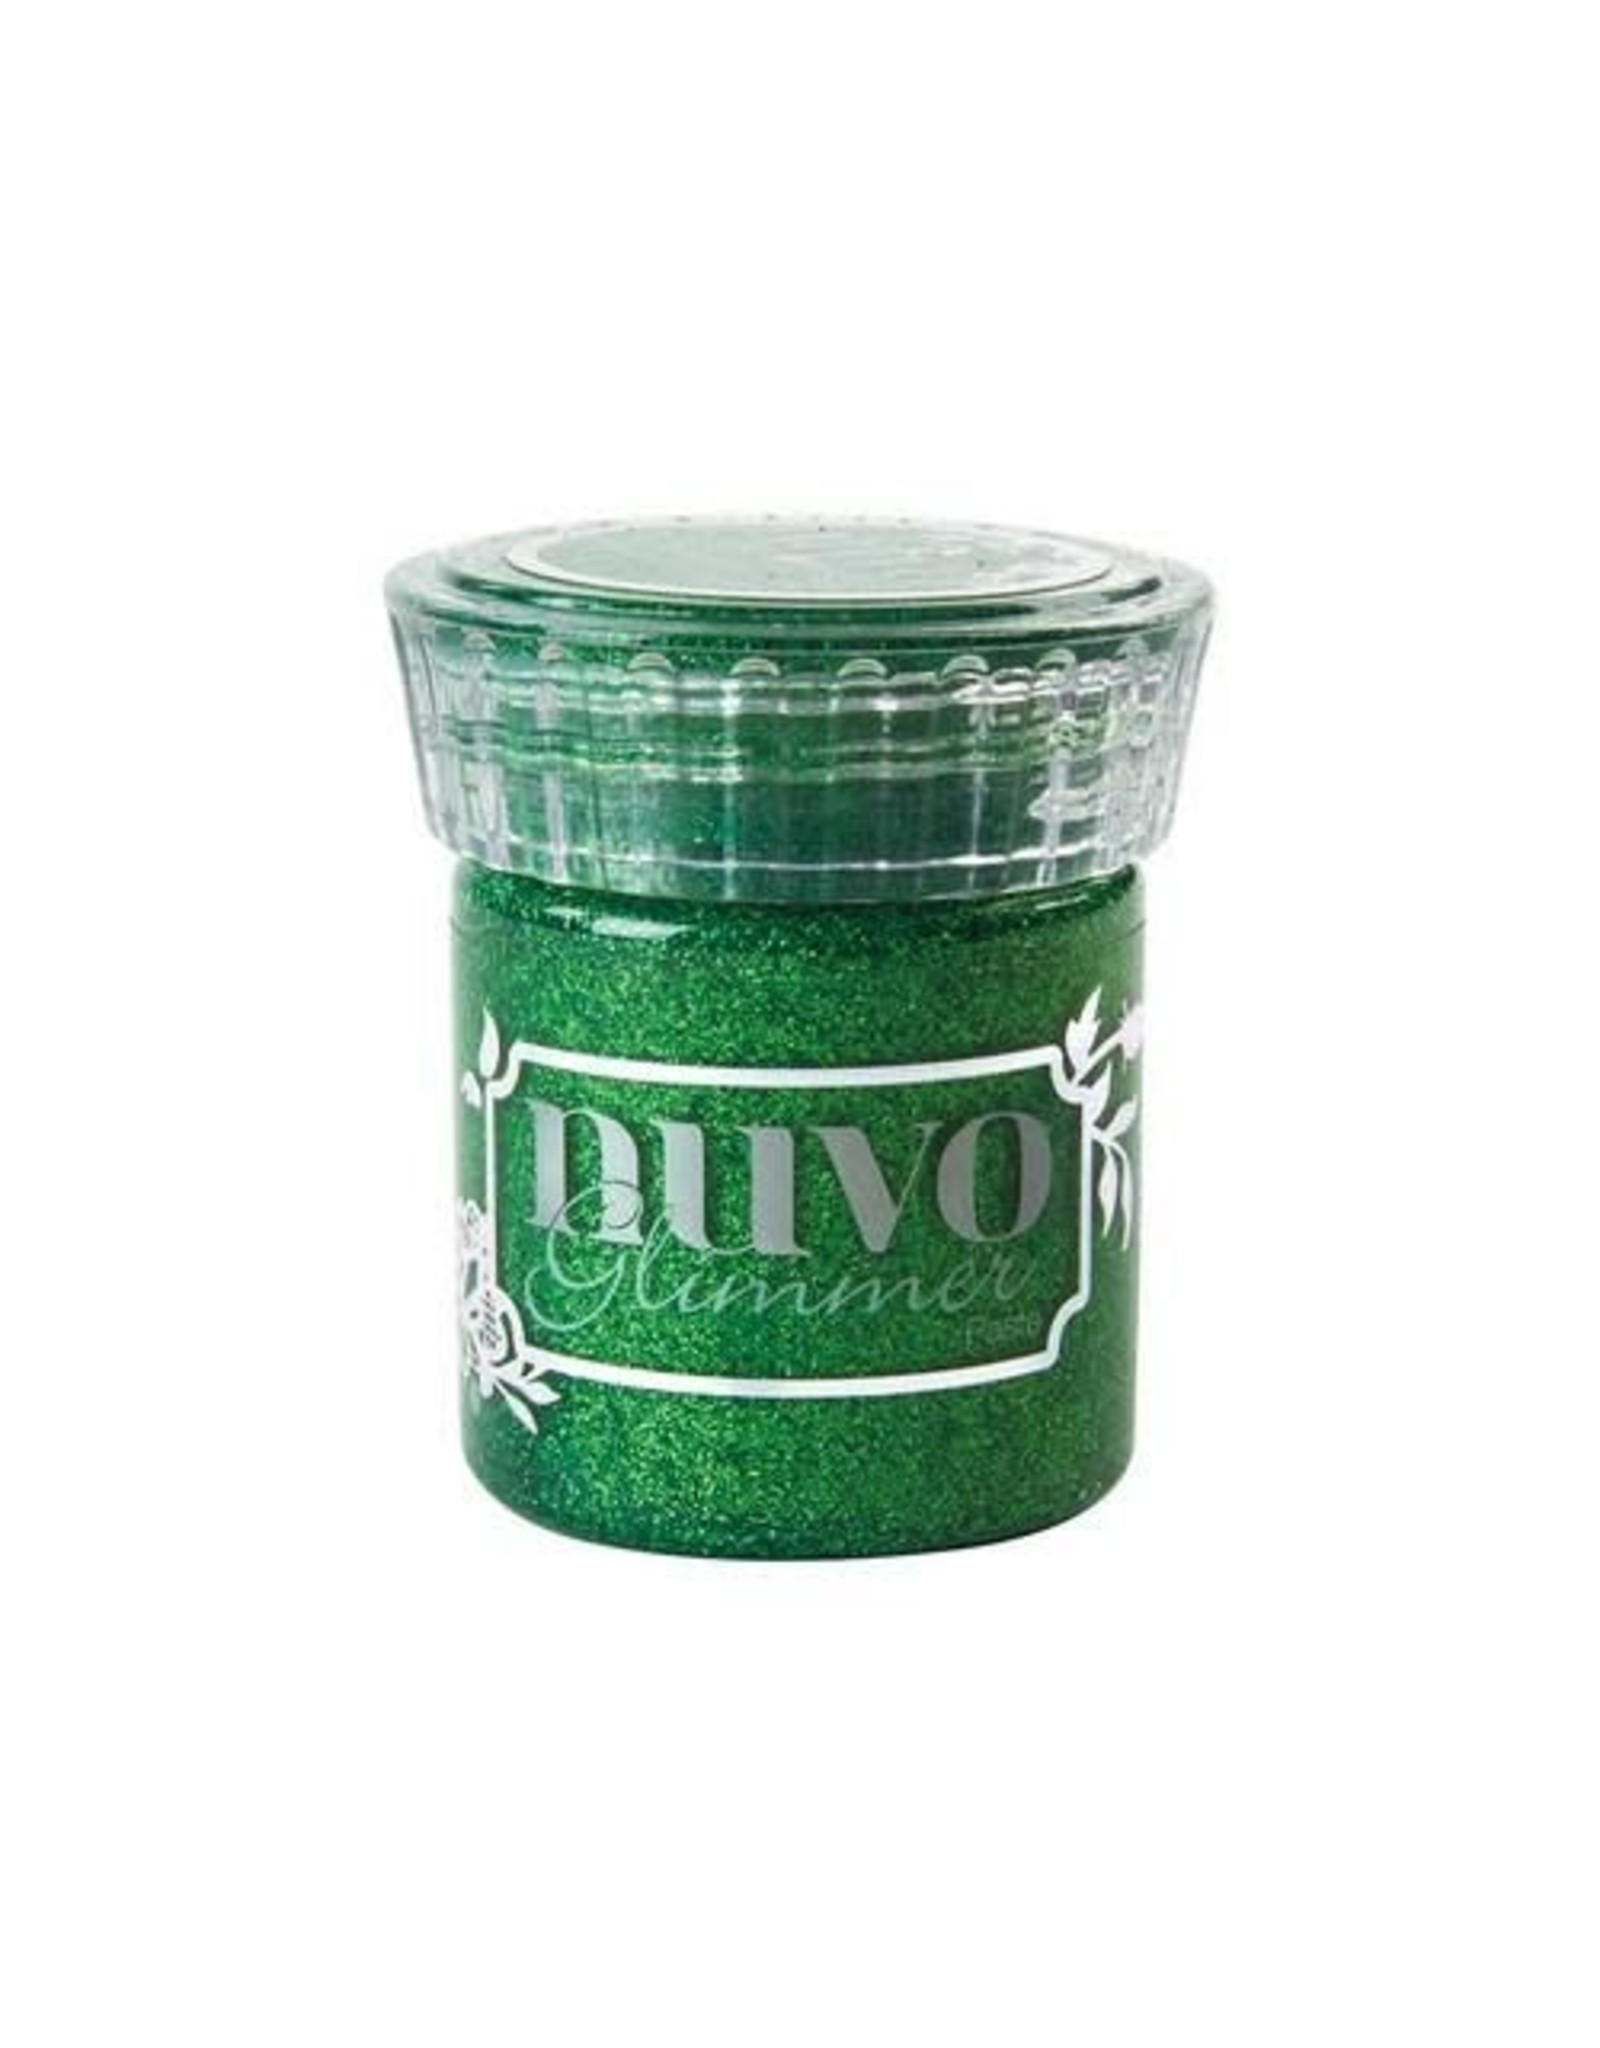 Nuvo Glitter Nuvo glimmer paste - emerald green 955N